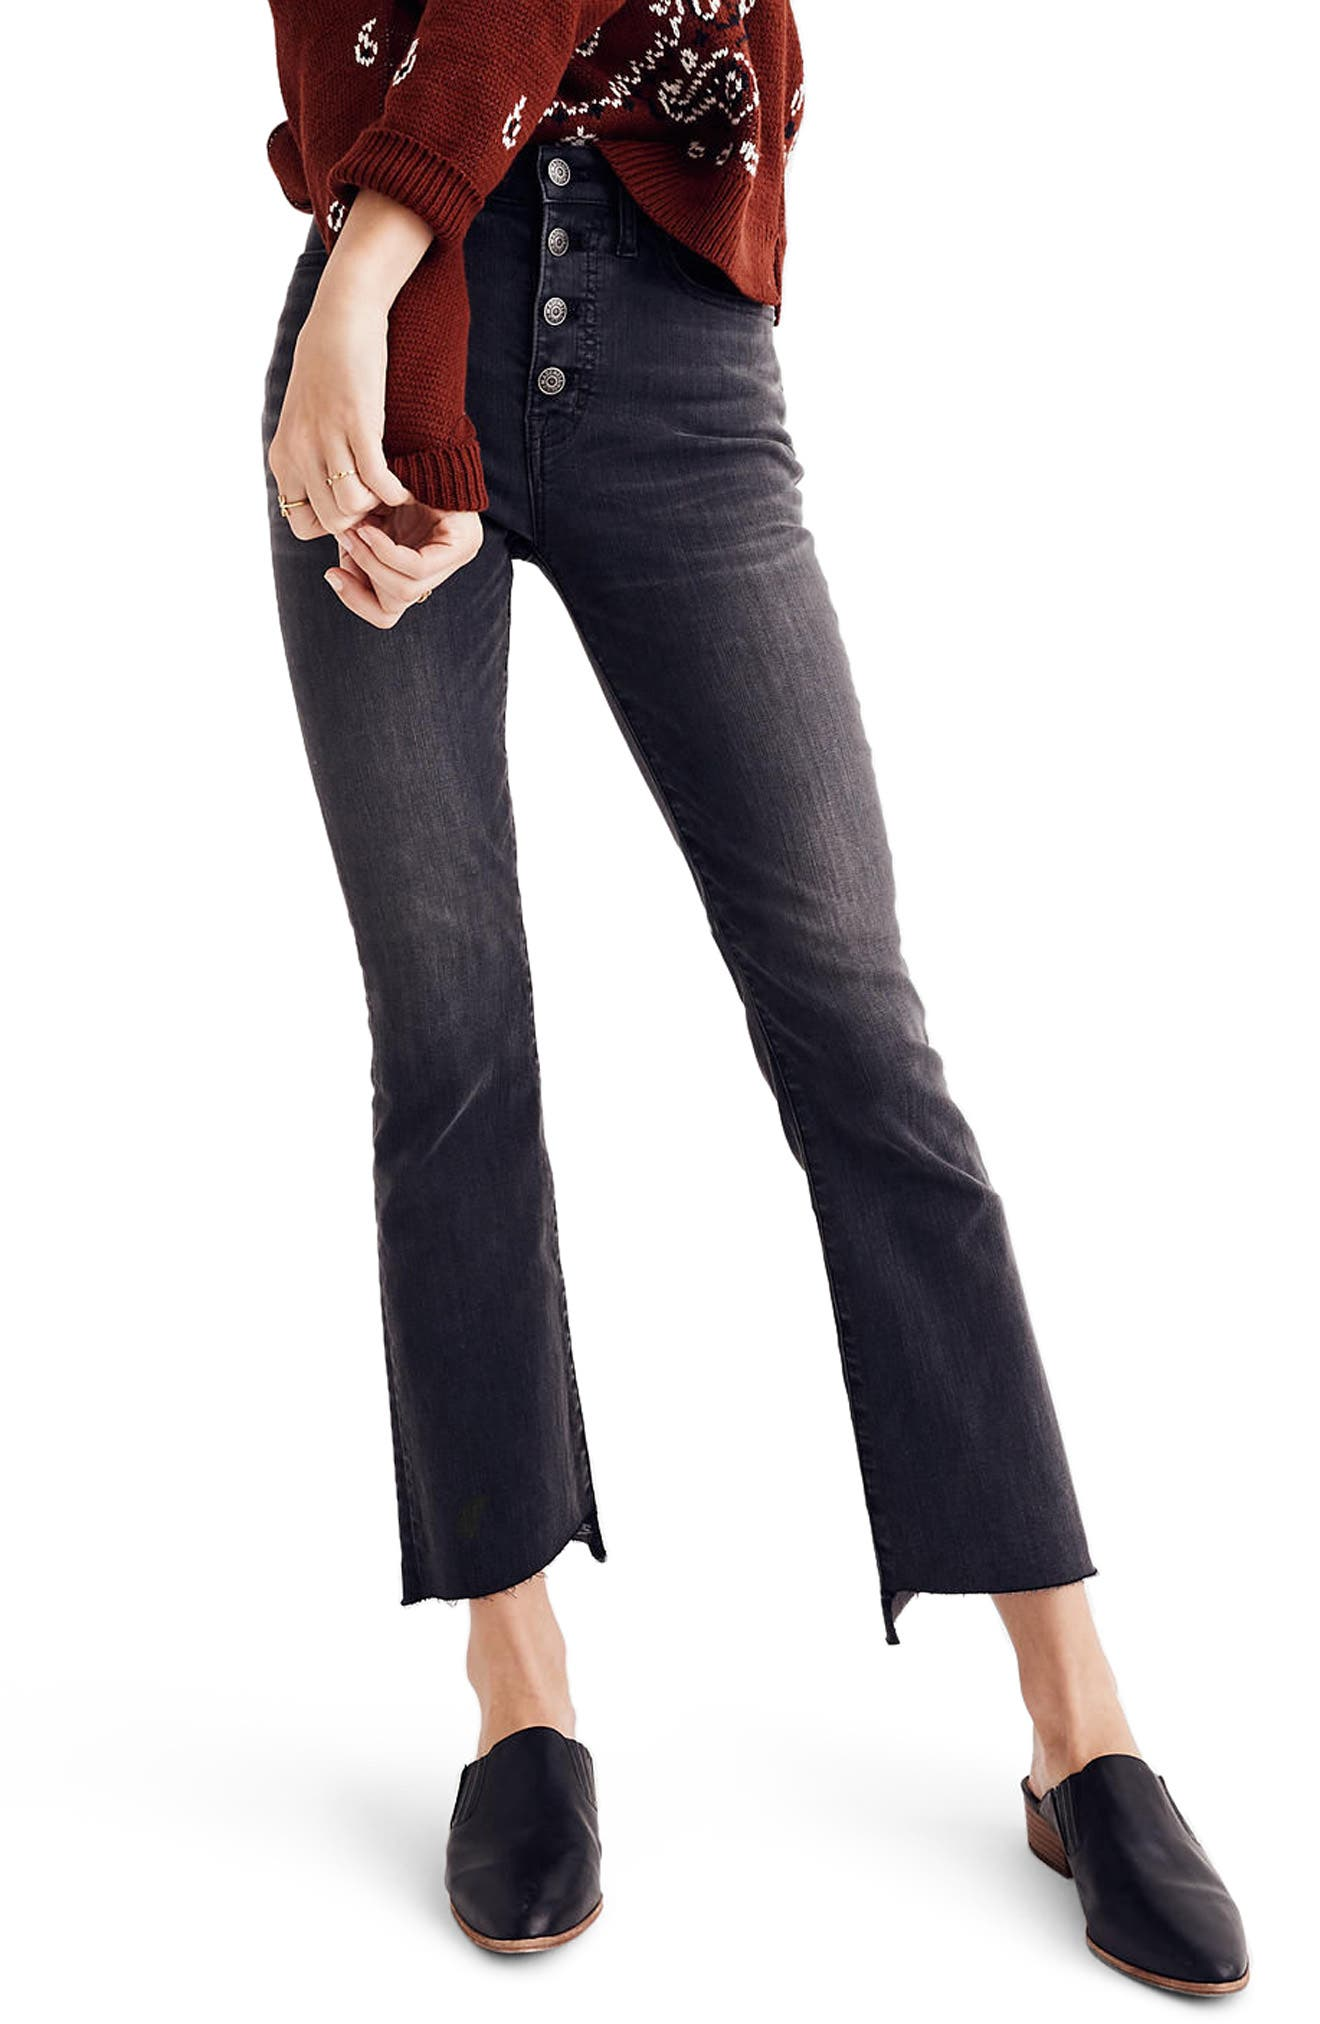 Cali Demi Bootcut Crop Jeans,                         Main,                         color, Woodston Wash